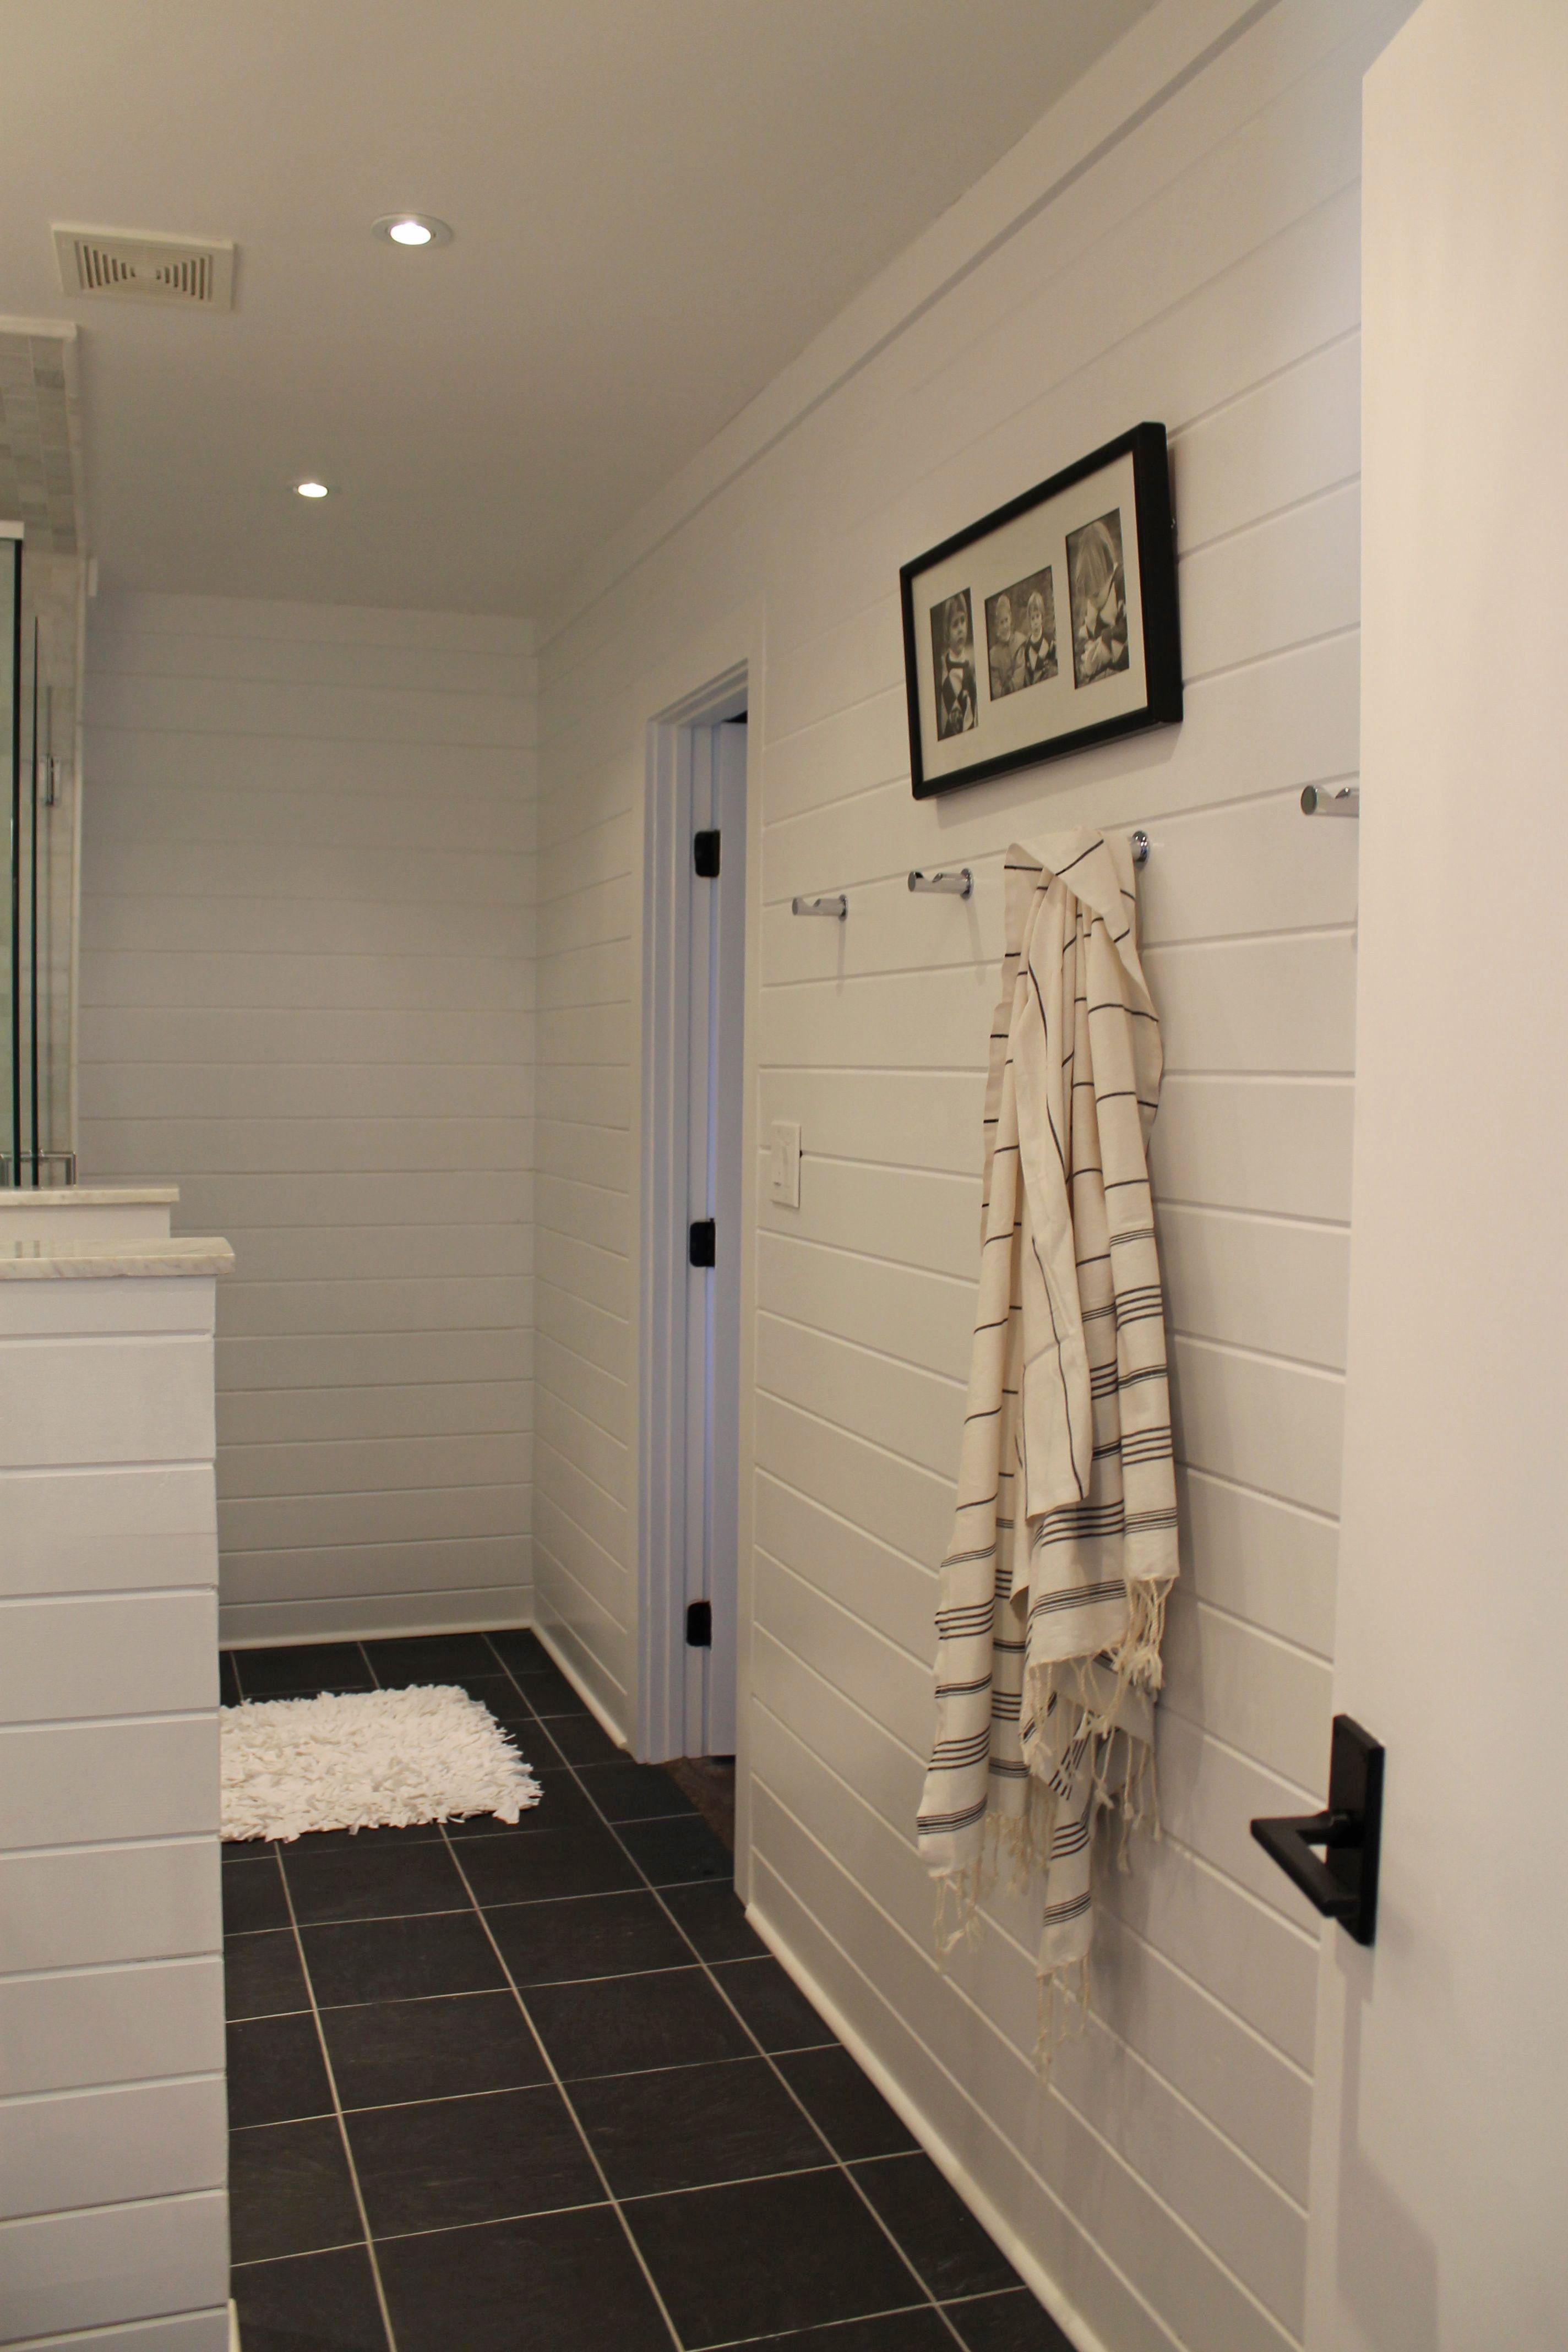 team ch home al bathroom in aw bathrooms remodeling dedicated windstorm corona riverside gallery birmingham bathefree smooth